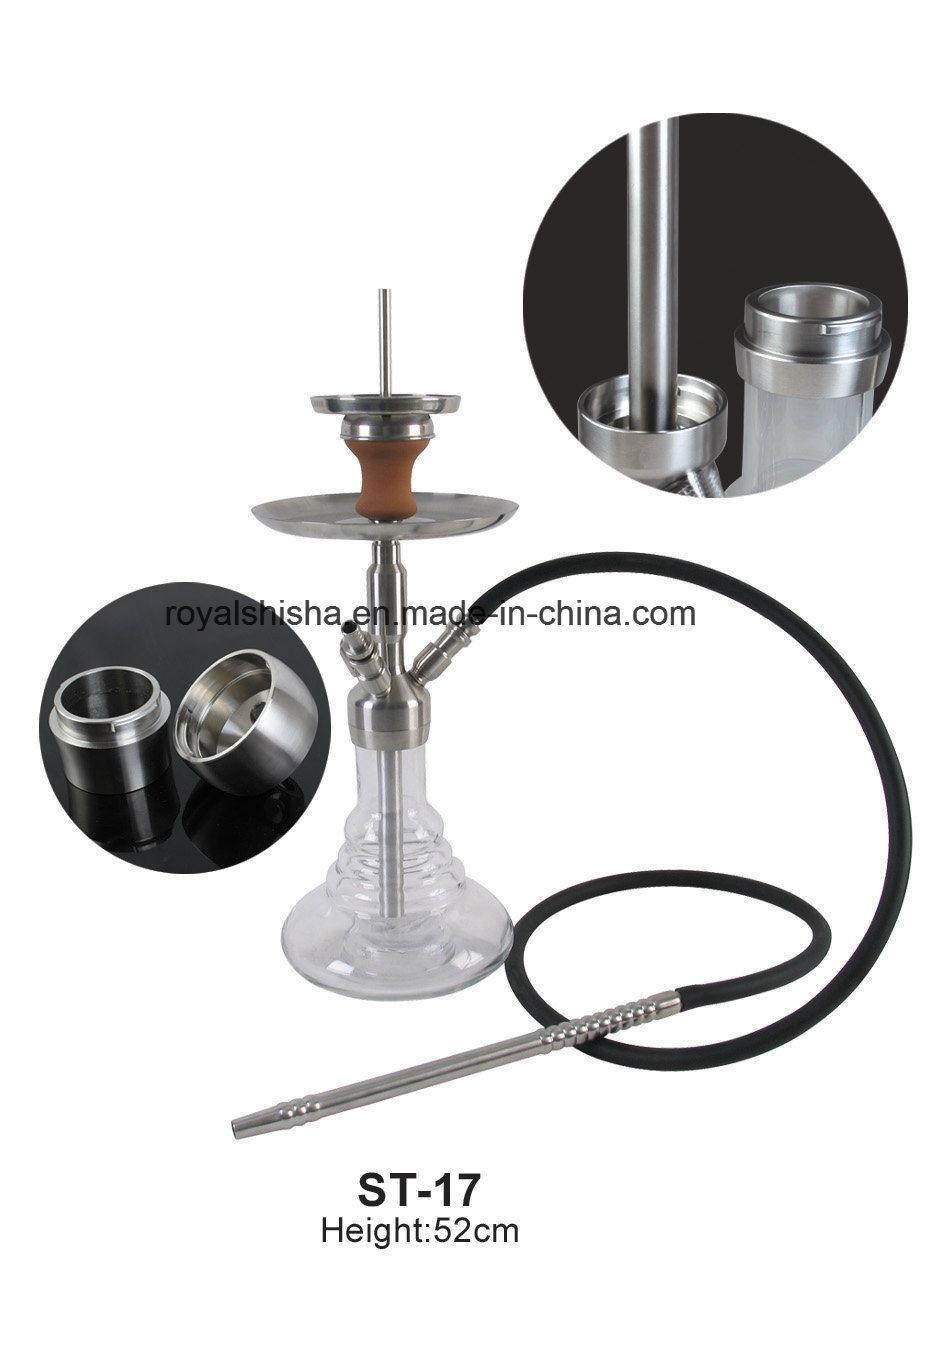 Al Fakher Tobacco High Quality Stainless Steel Nargile Hookah Shisha